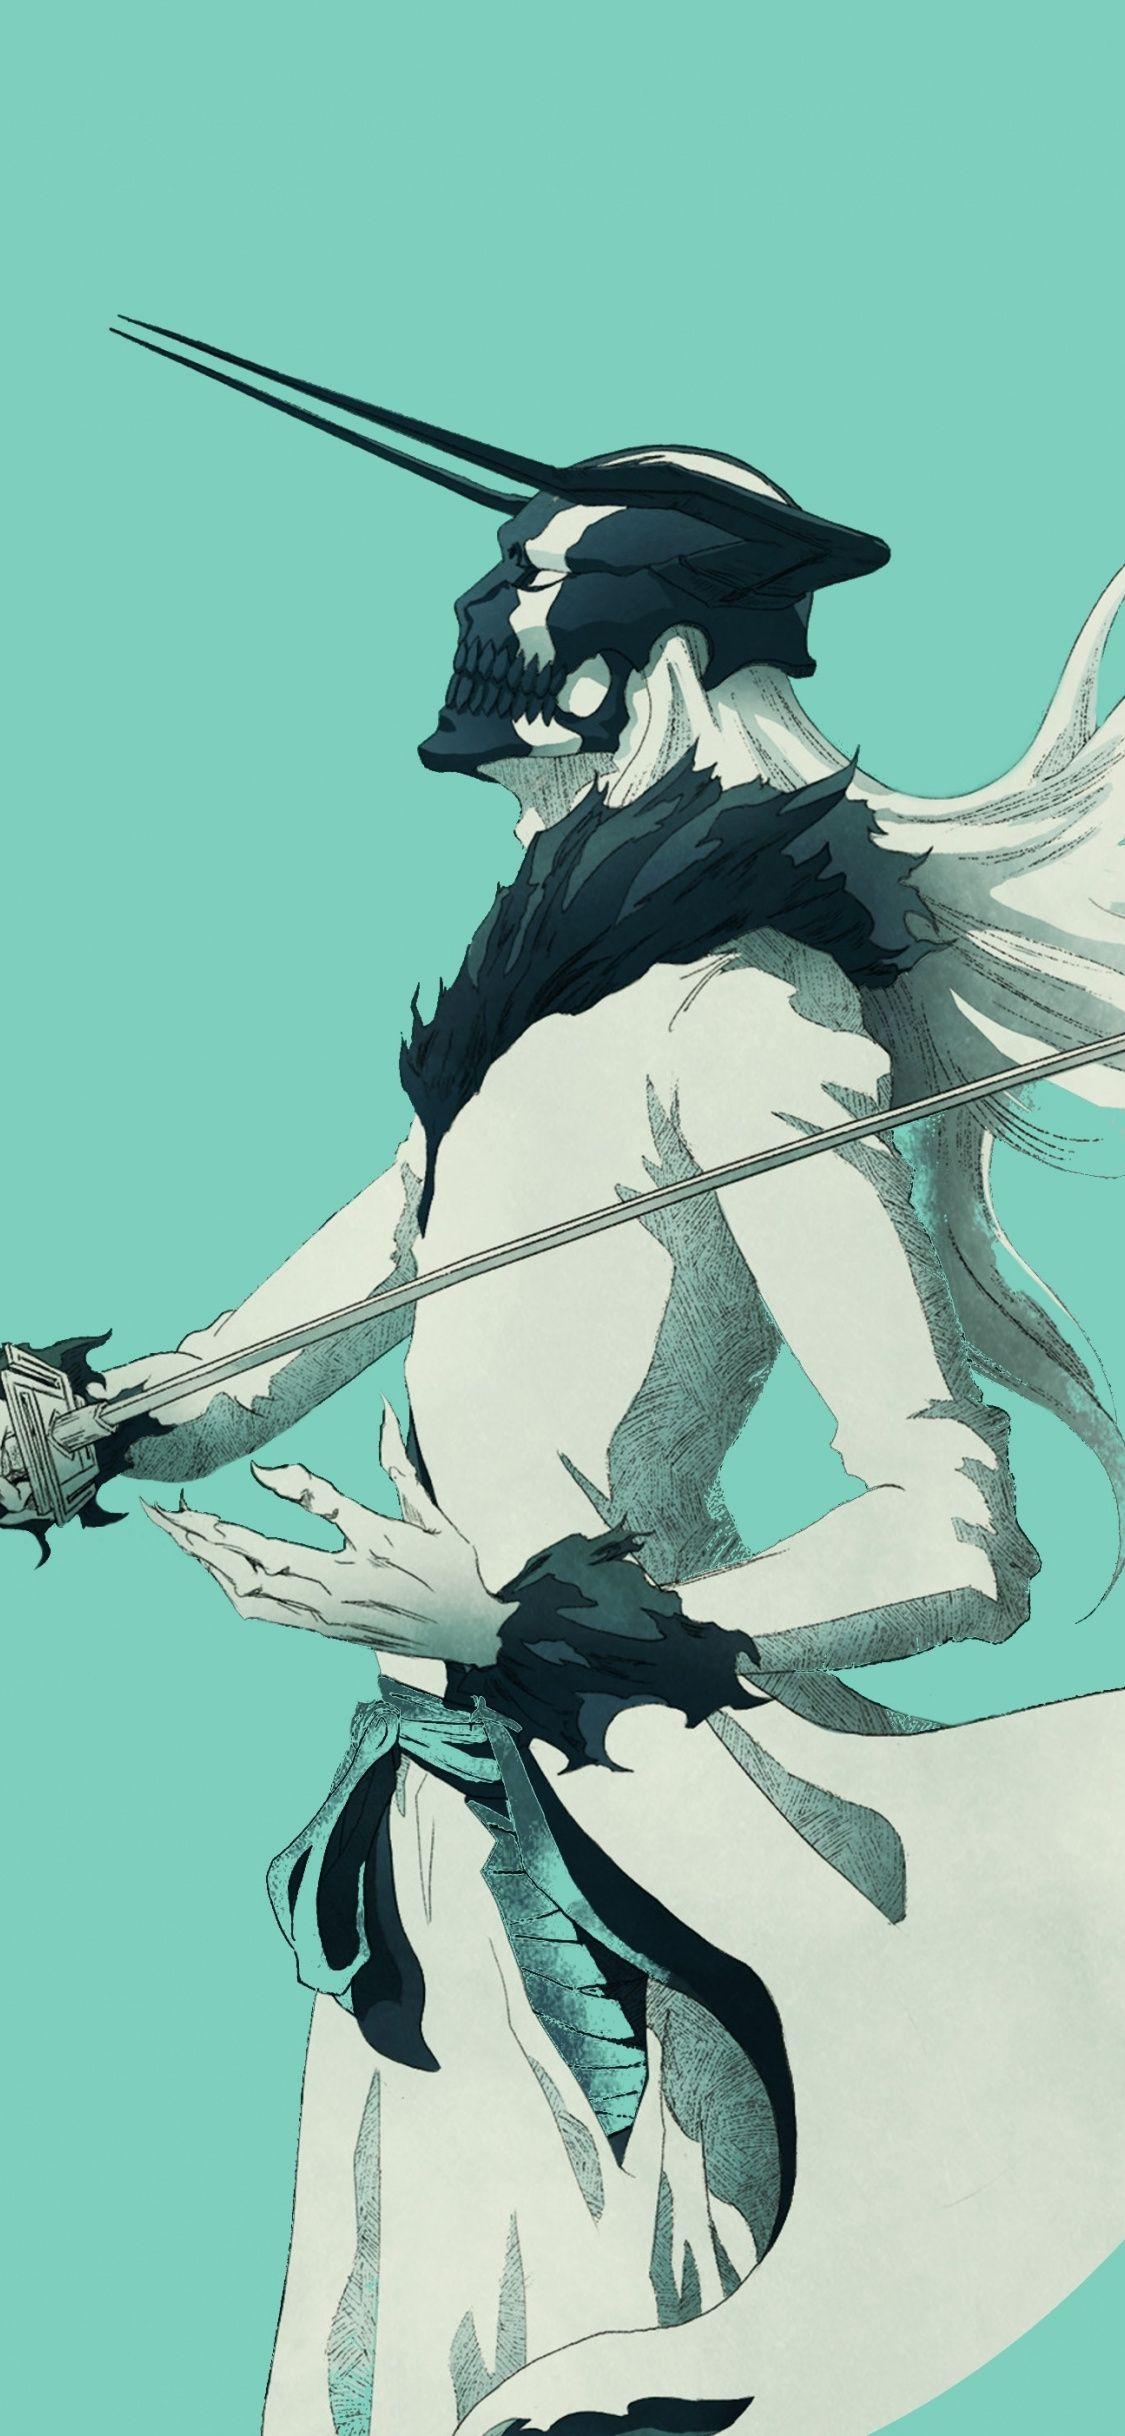 Anime, artwork, Ichigo Kurosaki, Bleach, 1125x2436 ...